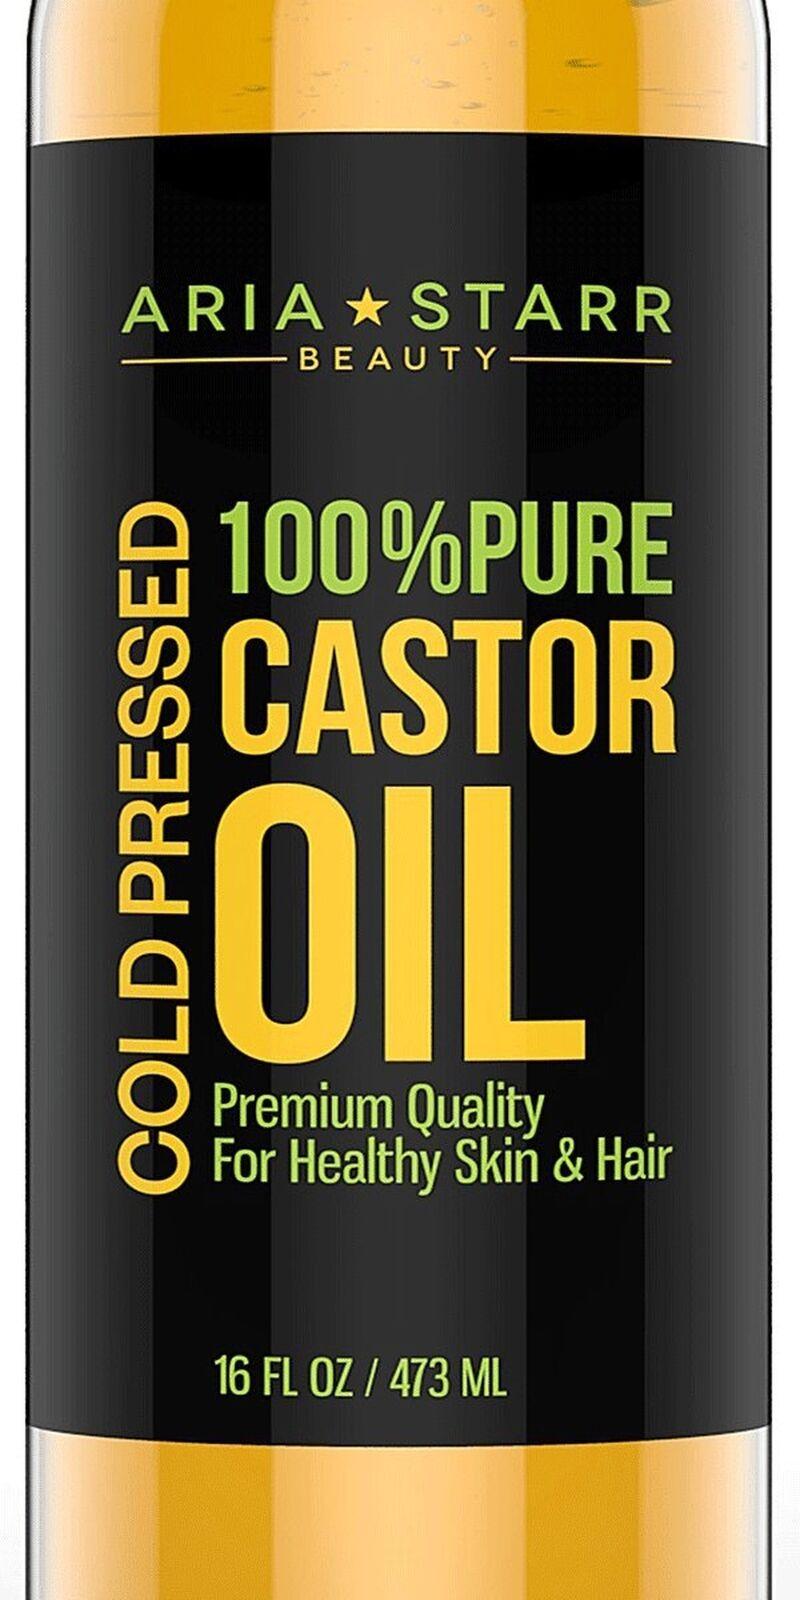 Castor Oil Cold Pressed - 16 FL OZ - BEST 100% Pure Hair Oil